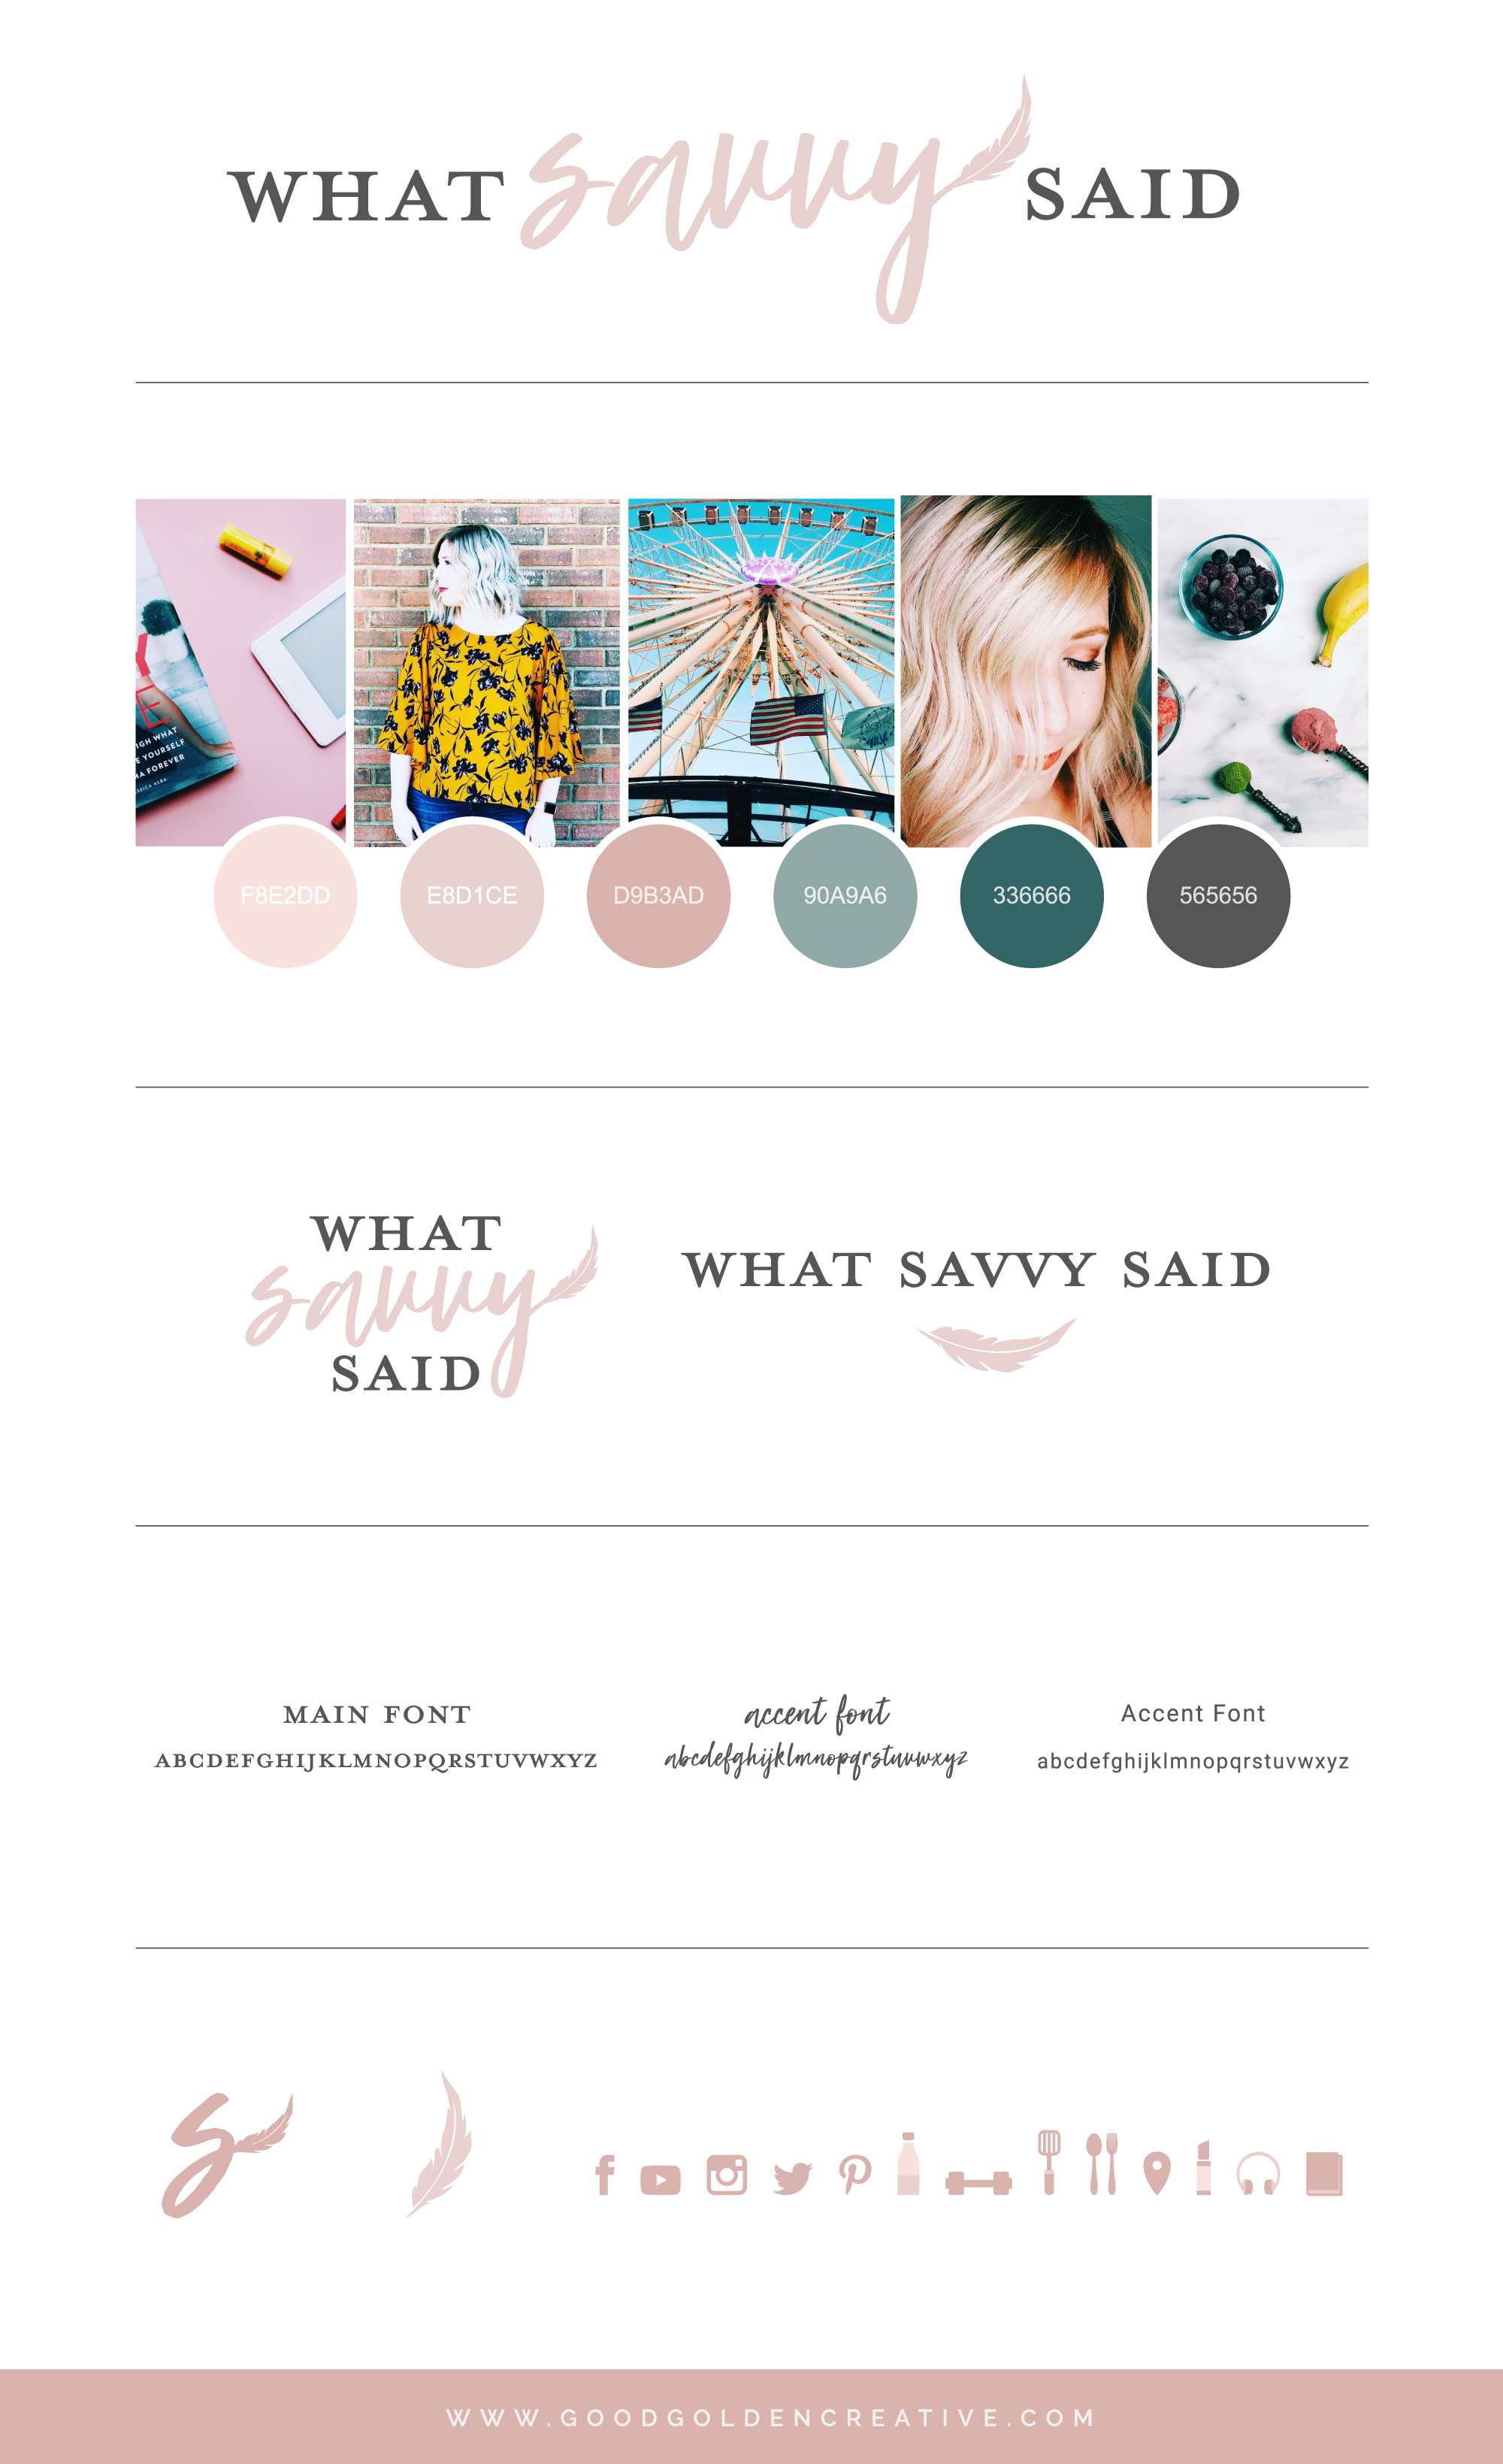 What-Savvy-Said-Brand-Board.jpg